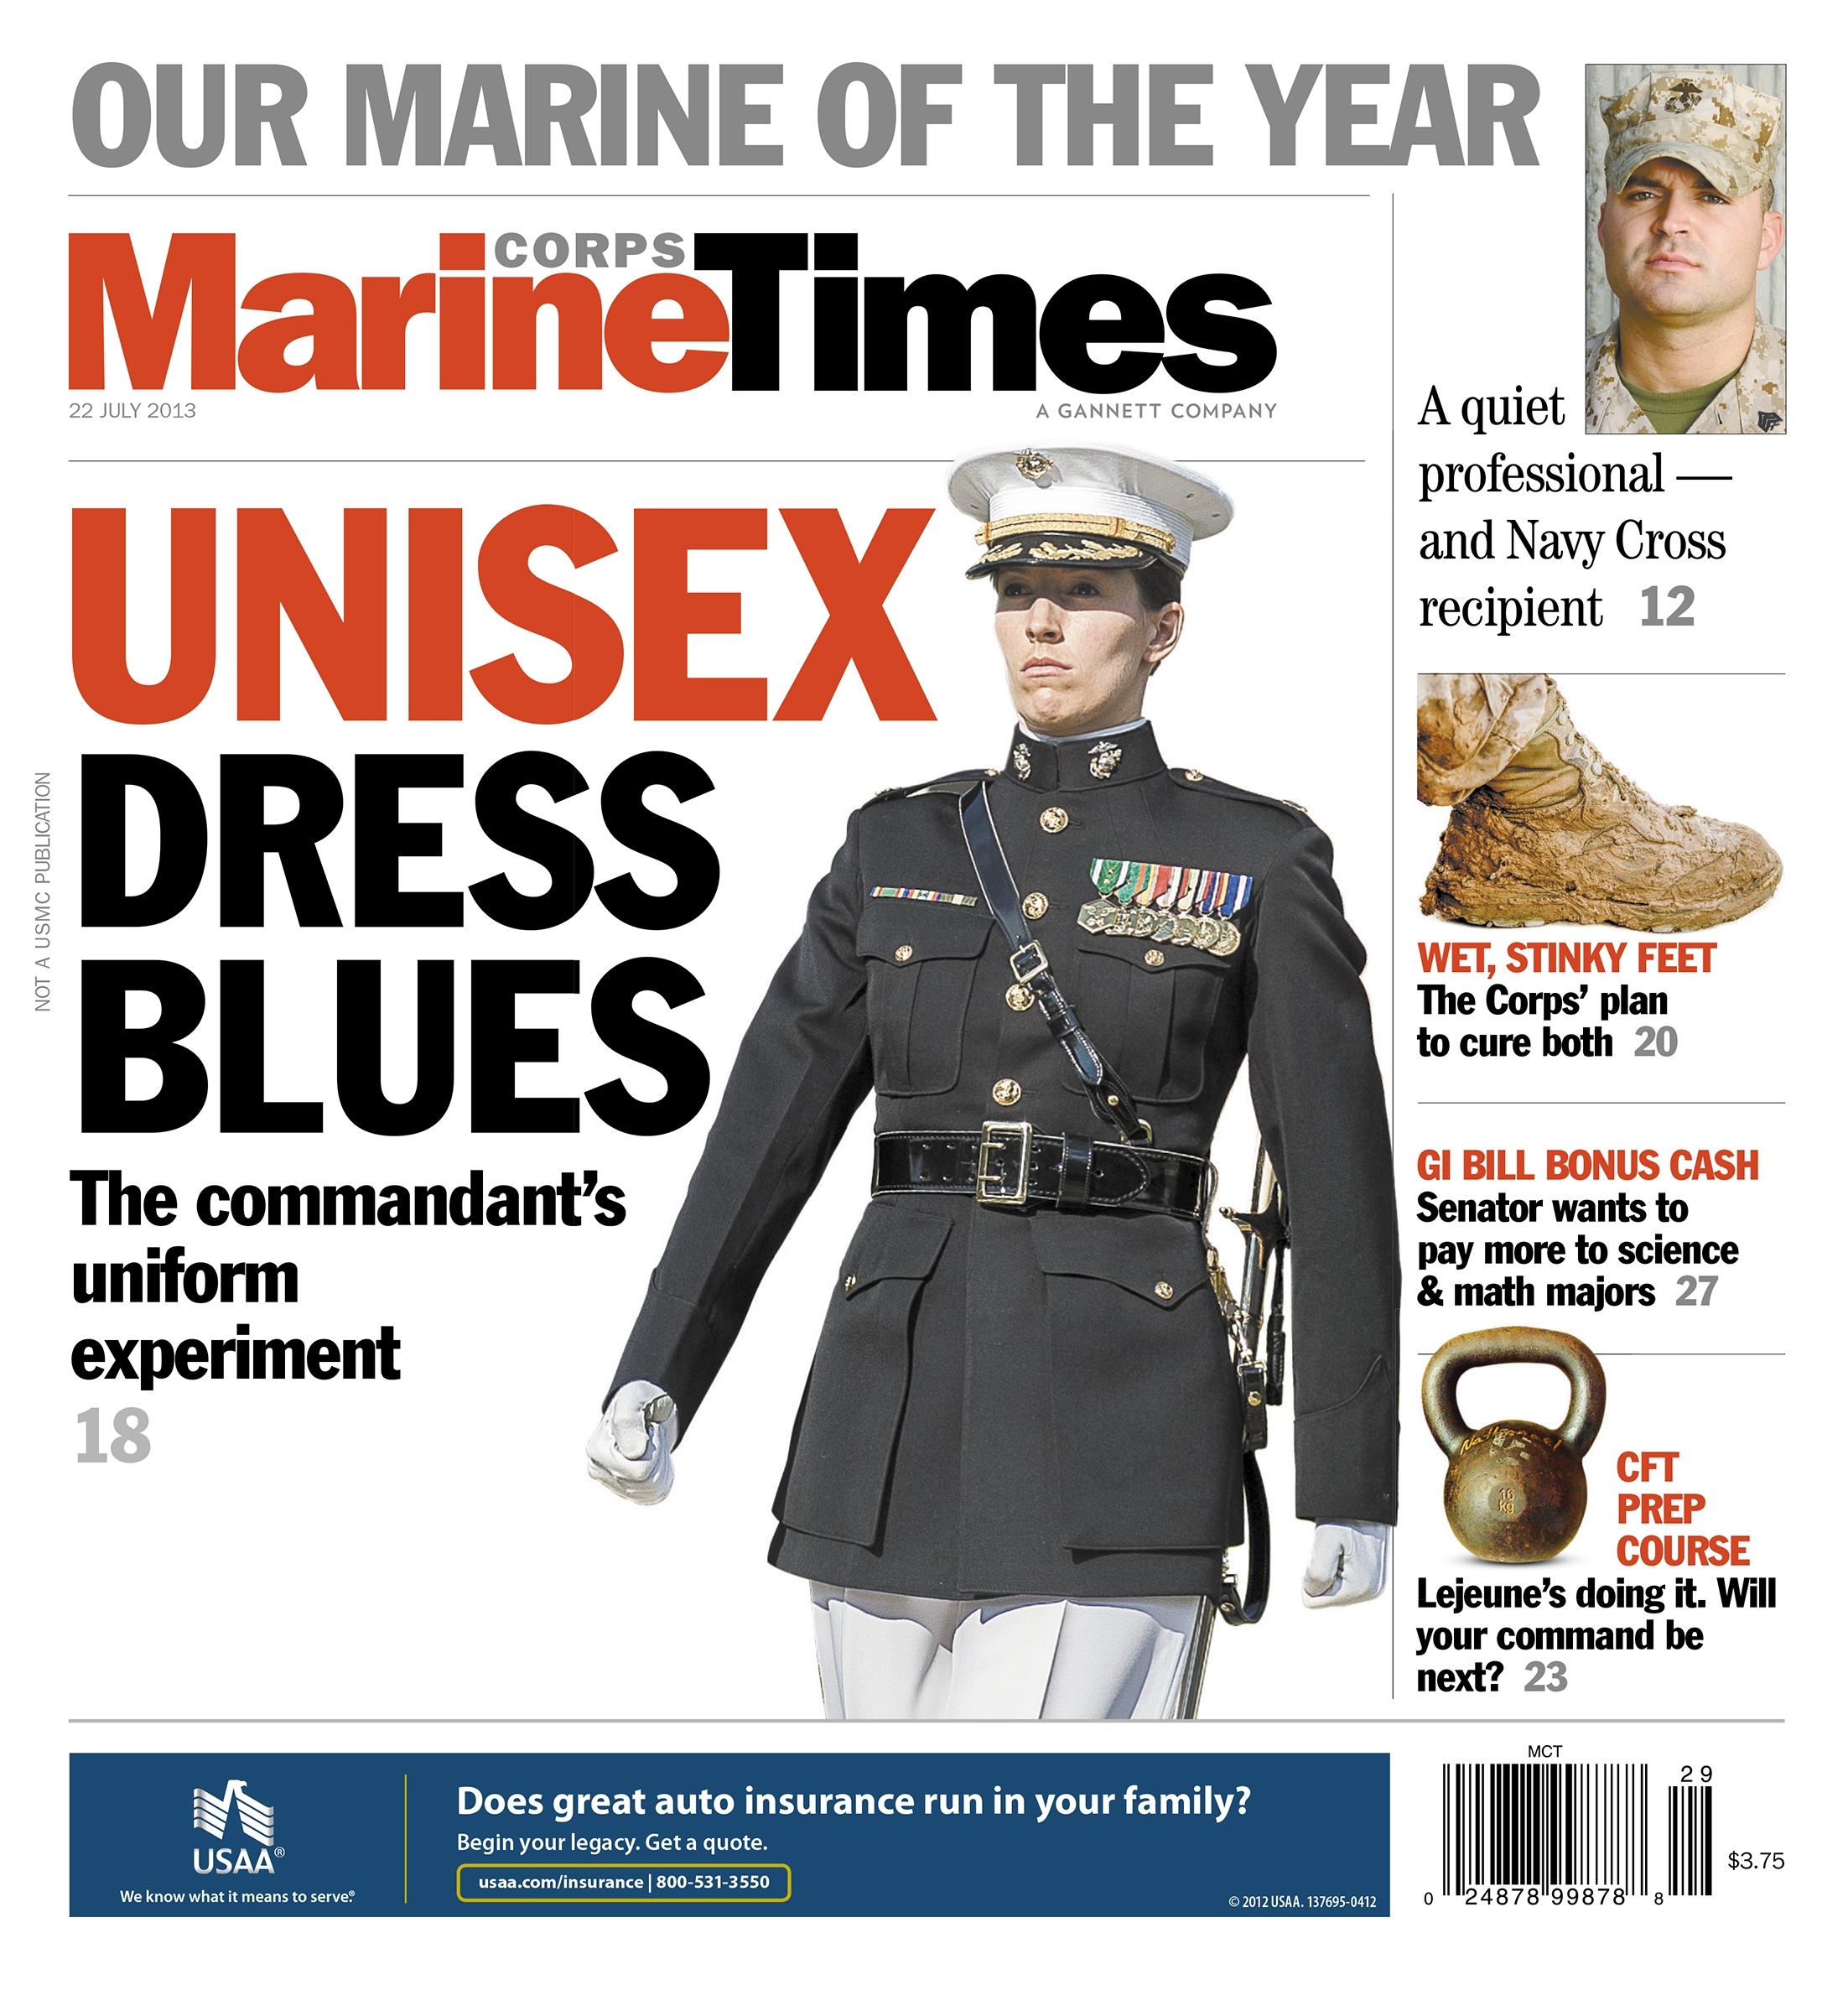 Marine Corps Dress Uniform Regulations 62